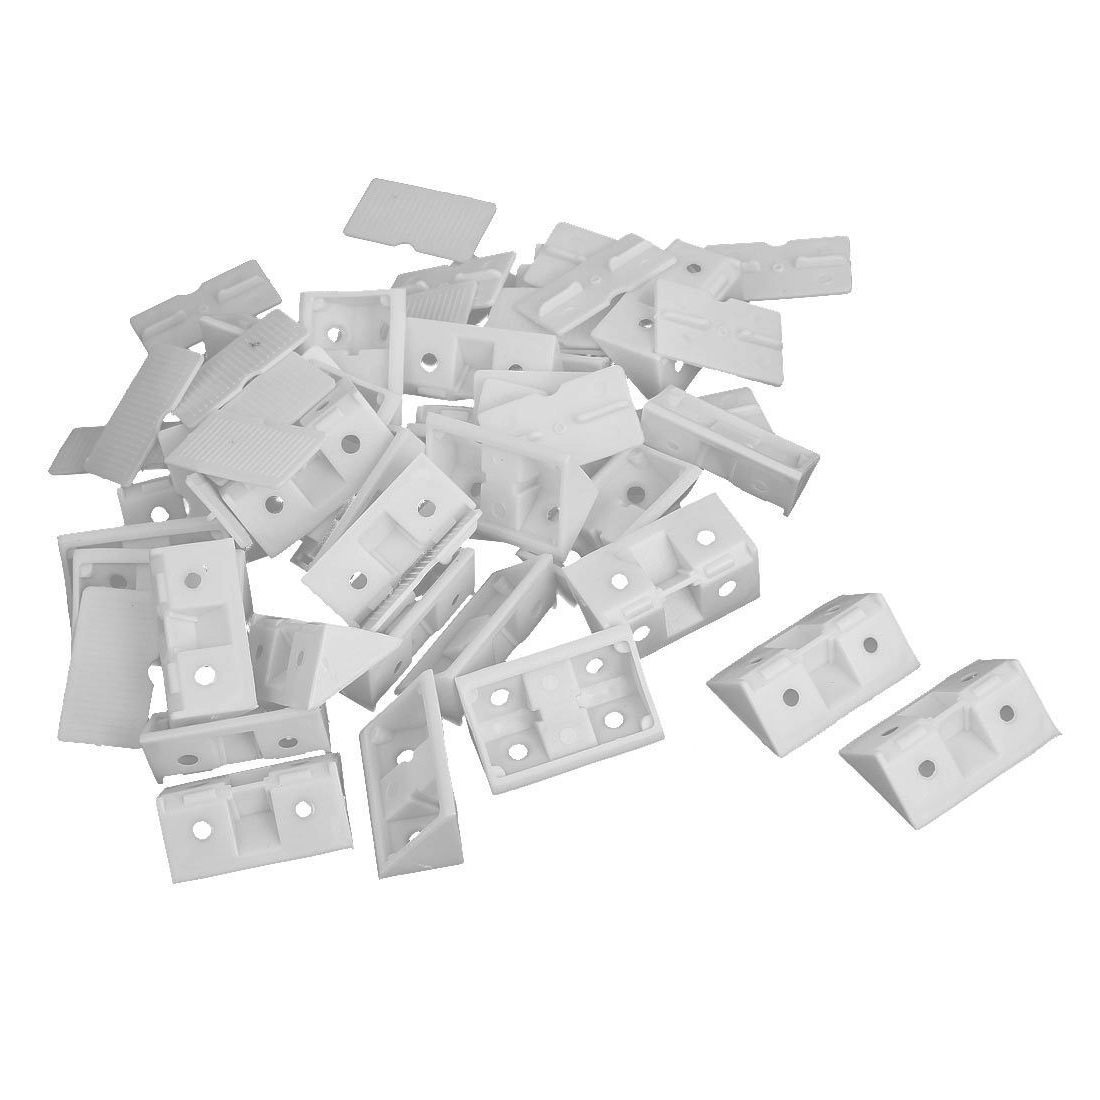 30pcs Shelf Cabinet 90 Degree Plastic Corner Braces Angle Brackets White